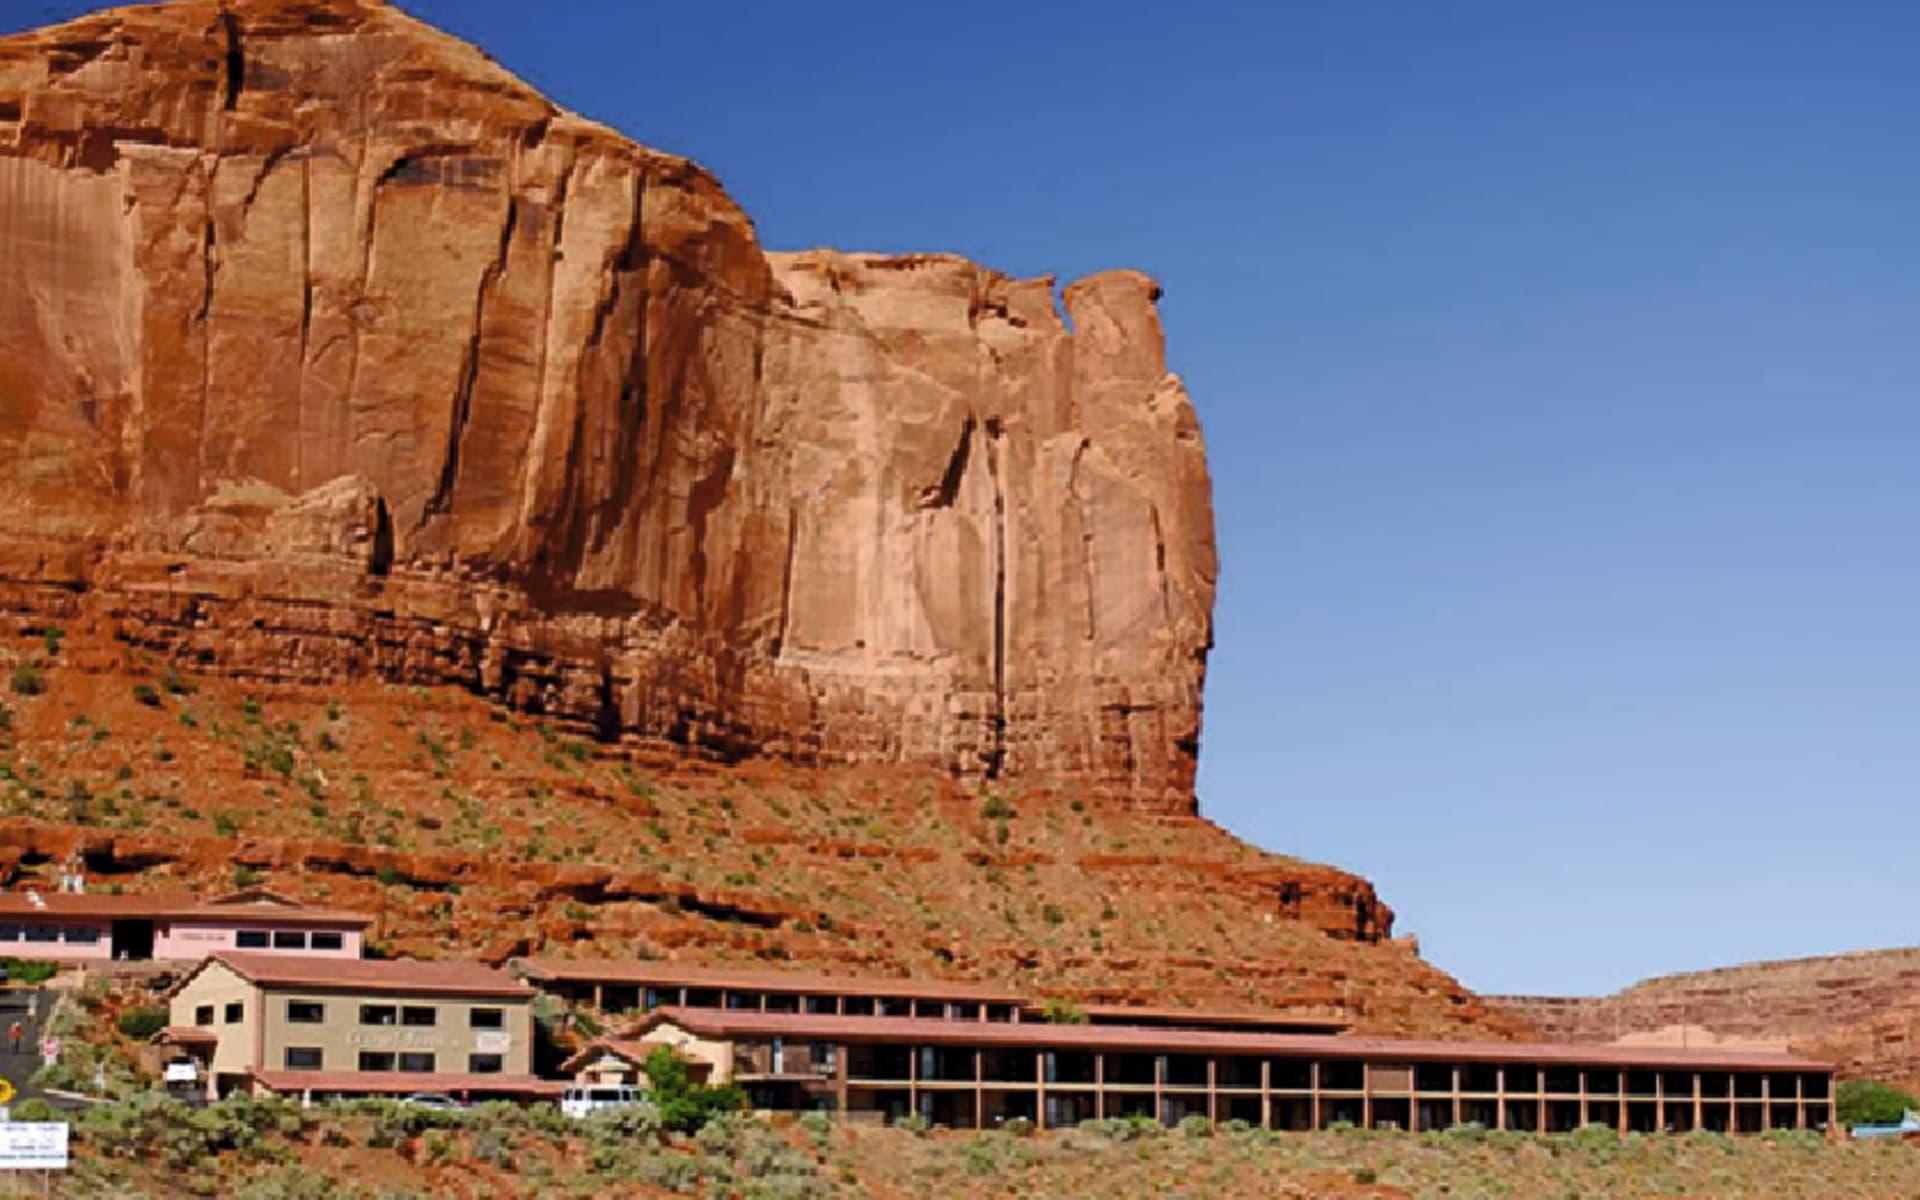 Goulding's Lodge in Monument Valley: exterior gouldings lodge steingebirge hotel